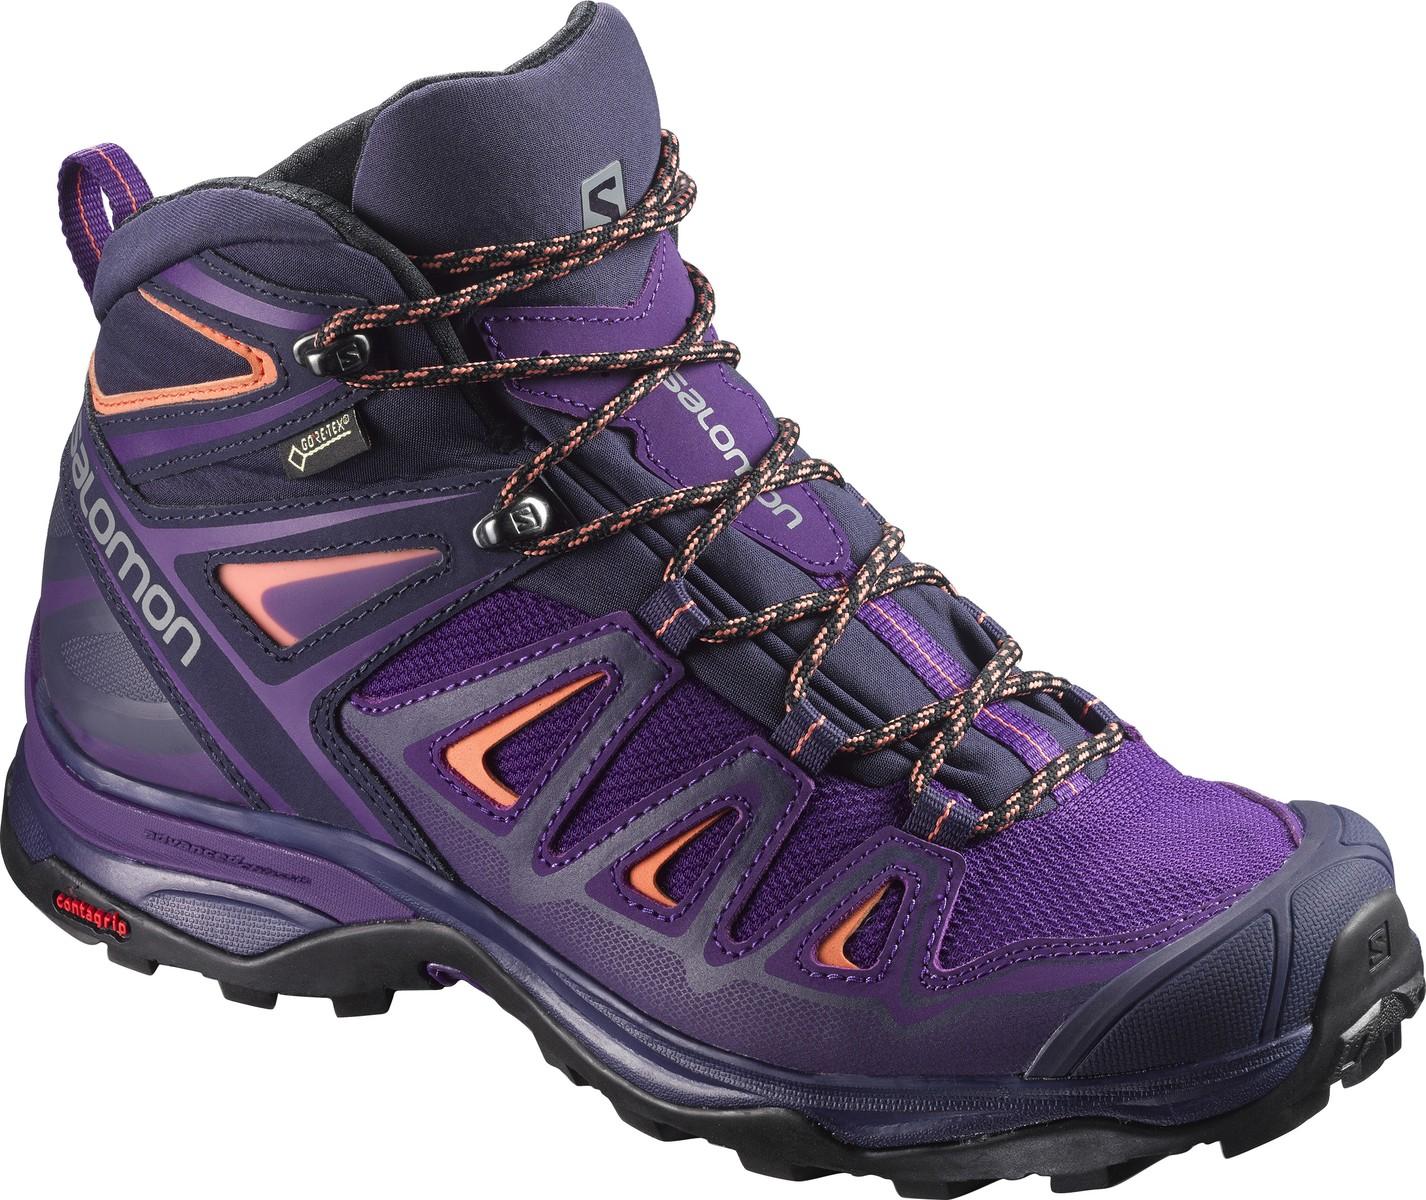 Salomon - X Ultra 3 Mid GTX® W - Walking Boots - Women's